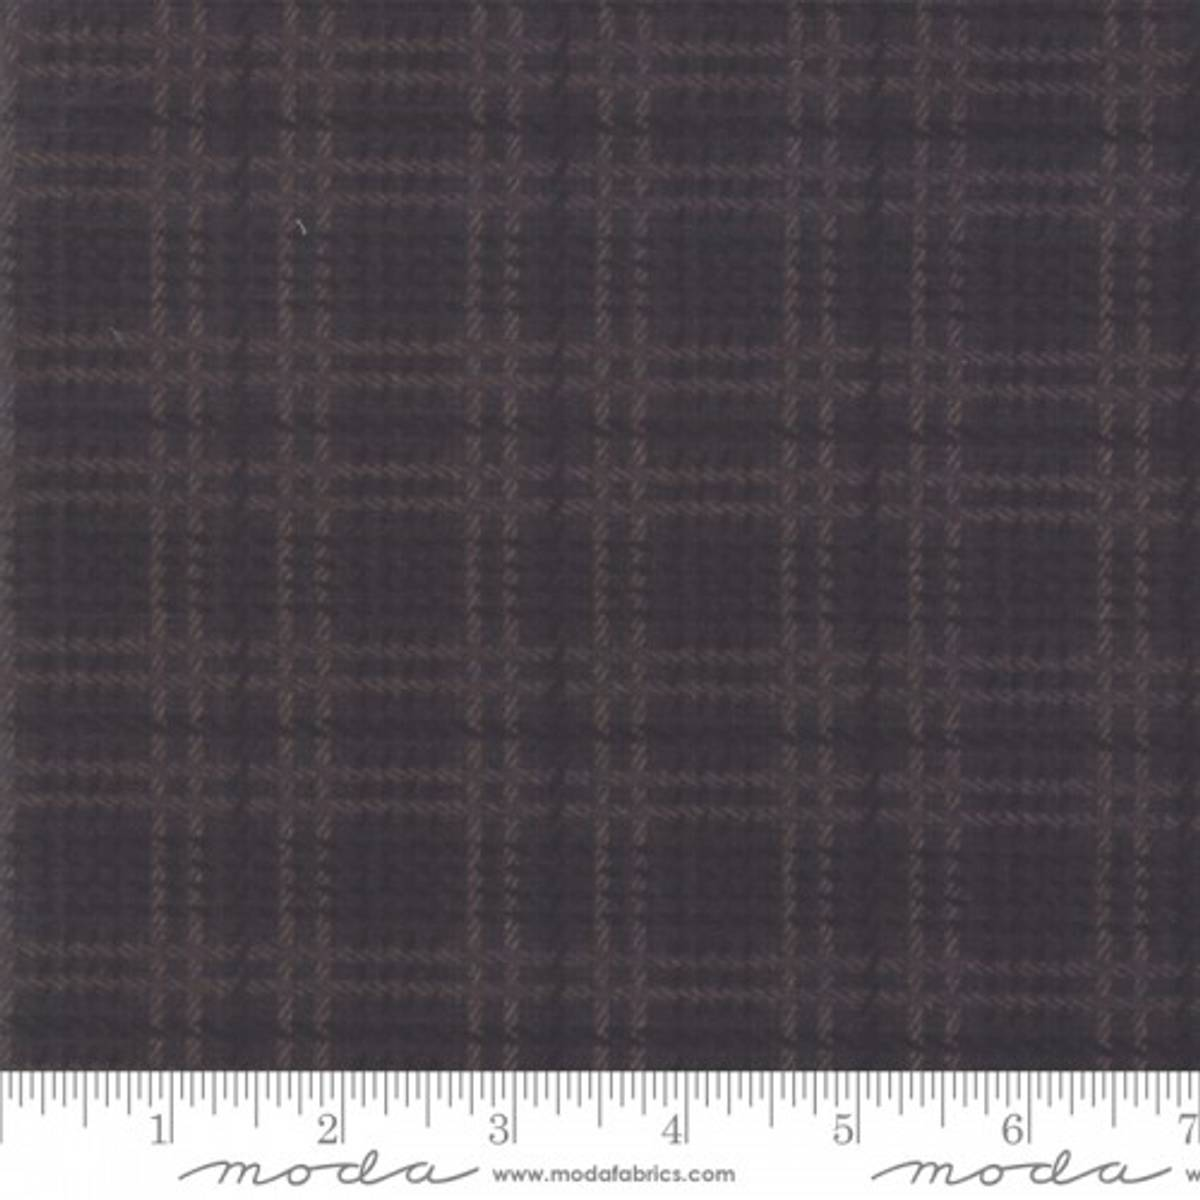 Moda Fabrics Farmhouse Flannels II, 49102 11F